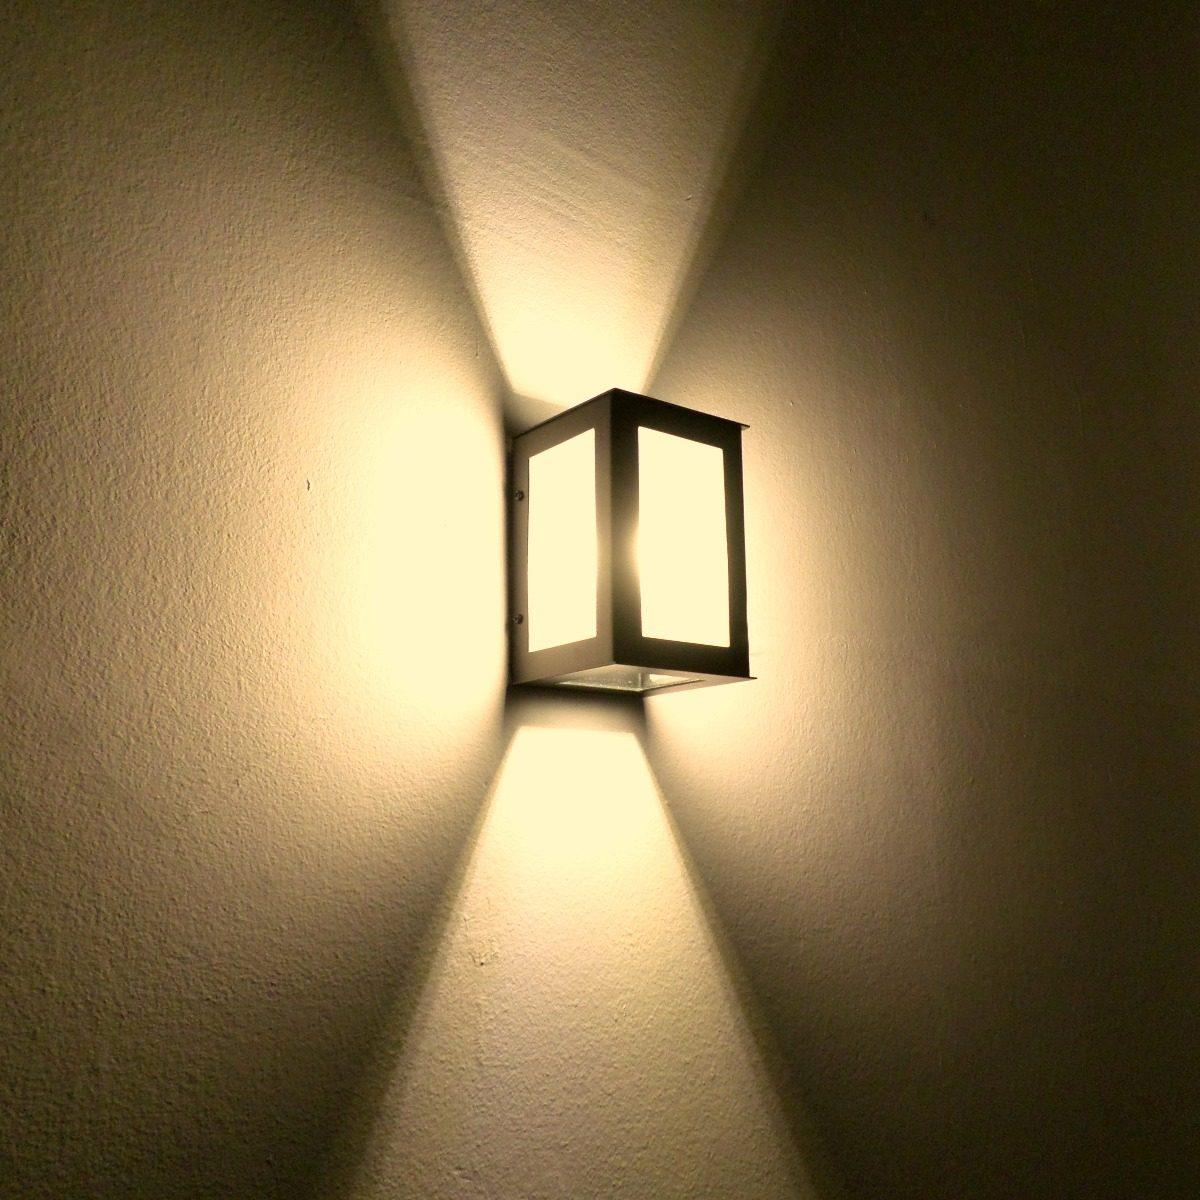 Artefactos Iluminacion Exterior Modernos Pared Led 8w Kit X2 - Artefactos-de-iluminacion-exterior